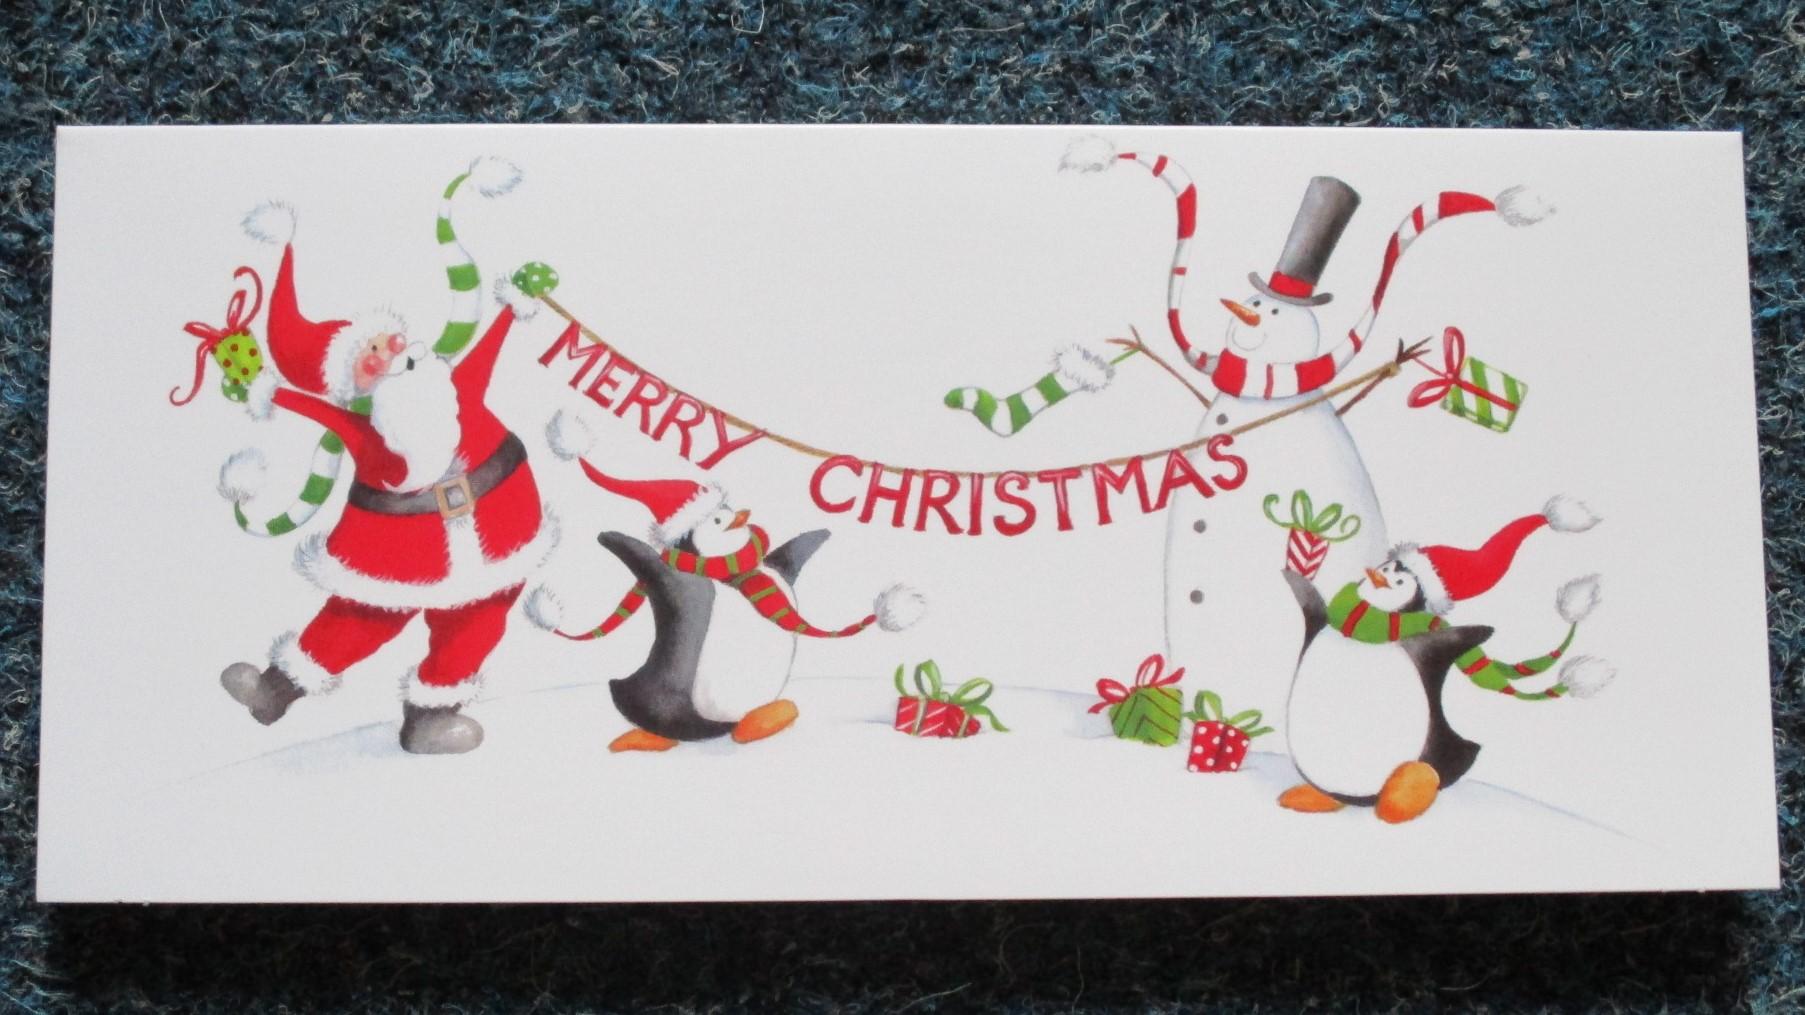 Merry Christmas £3